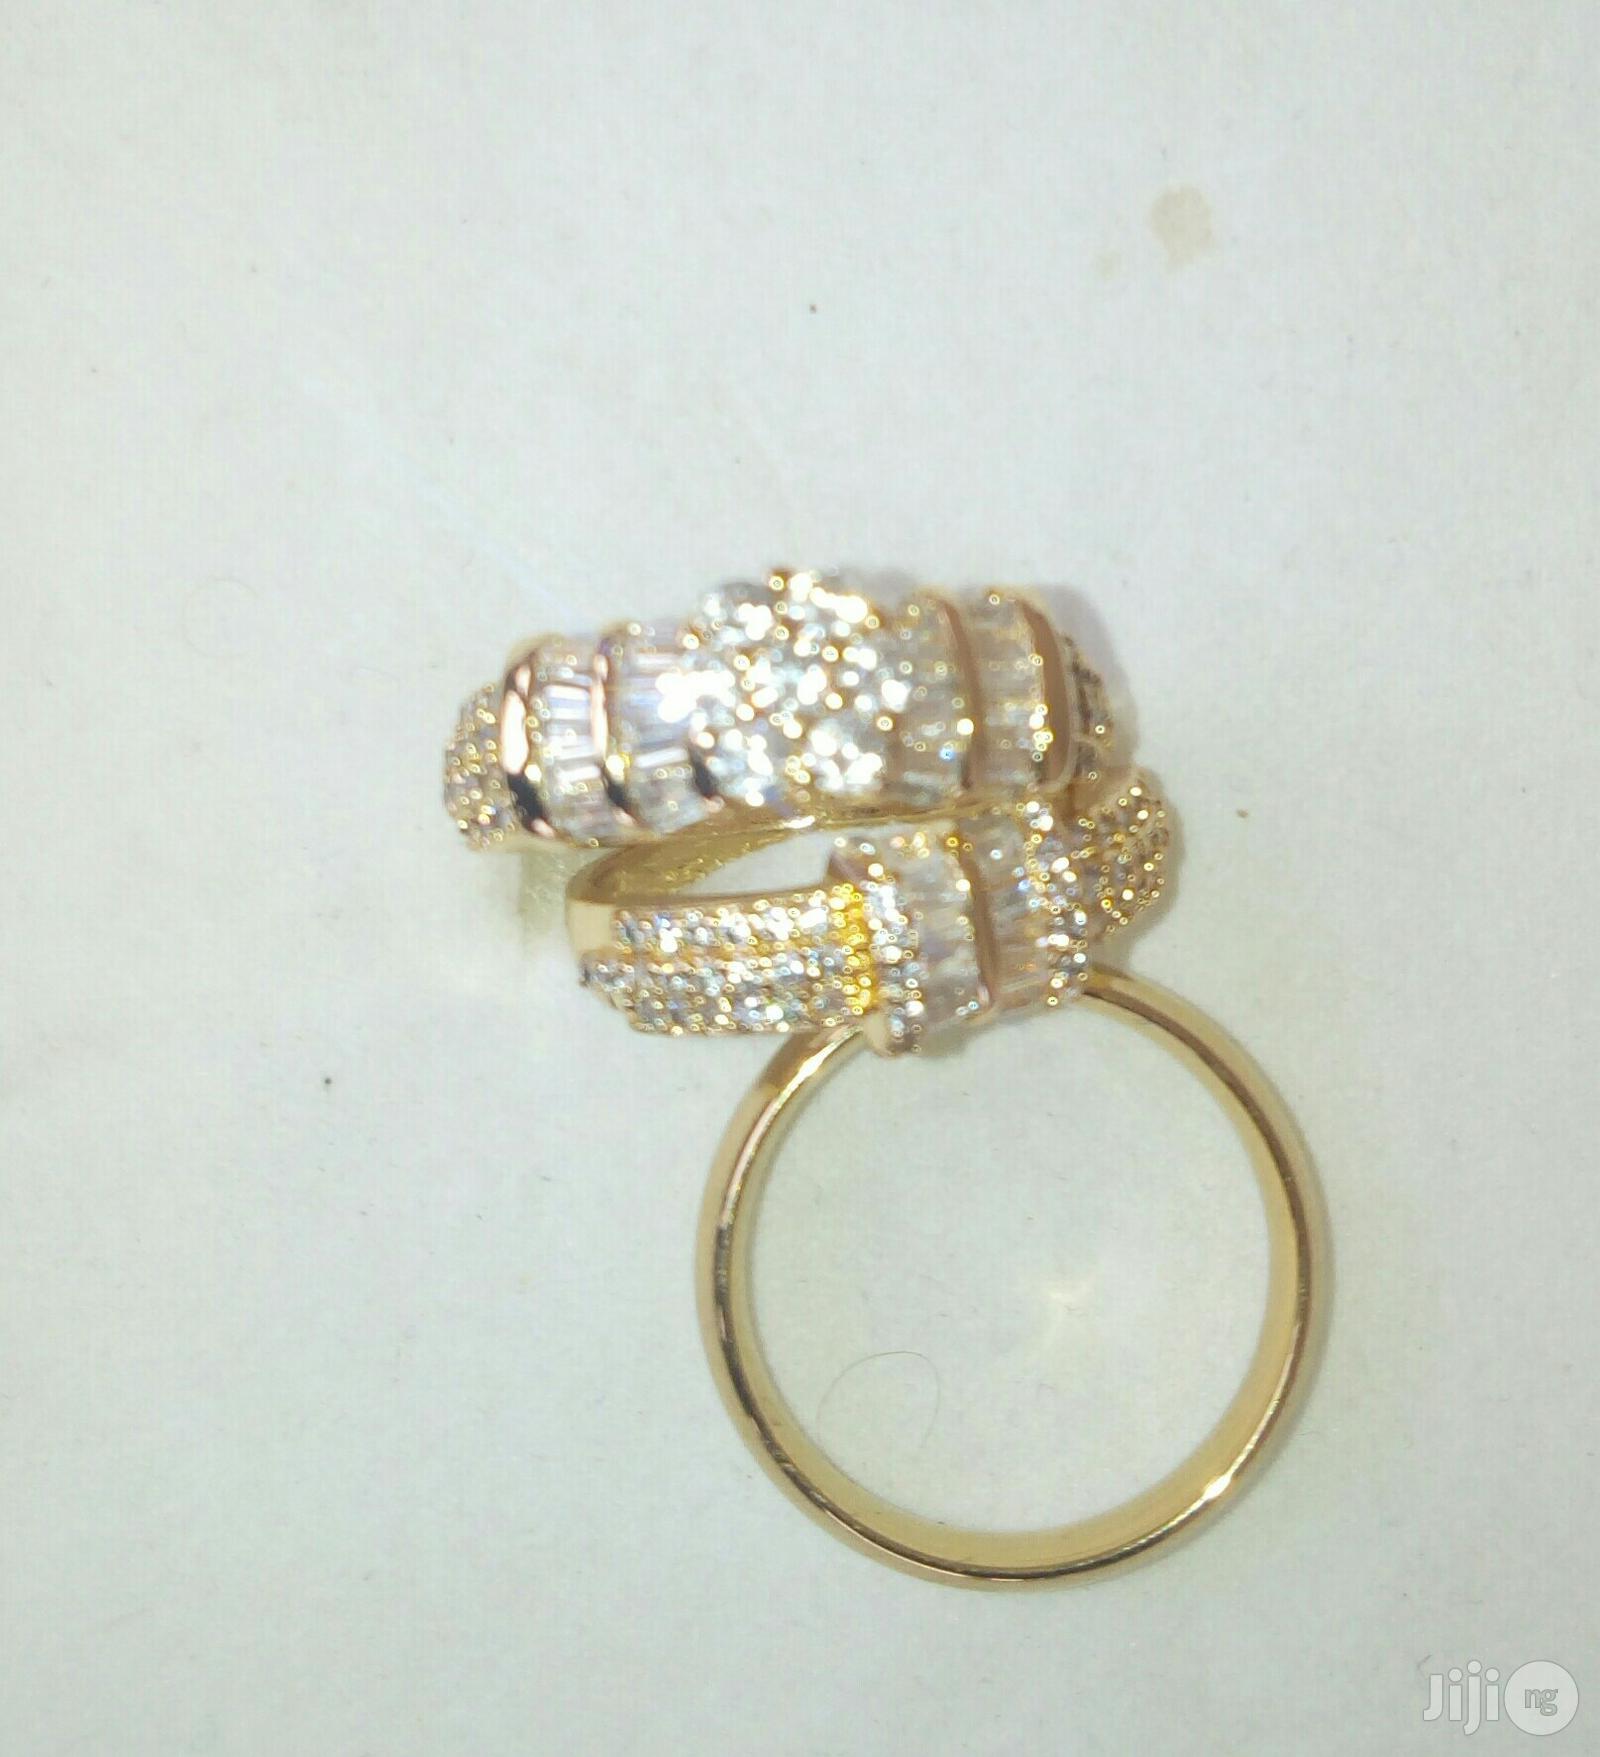 Romanian Gold Wedding Rings